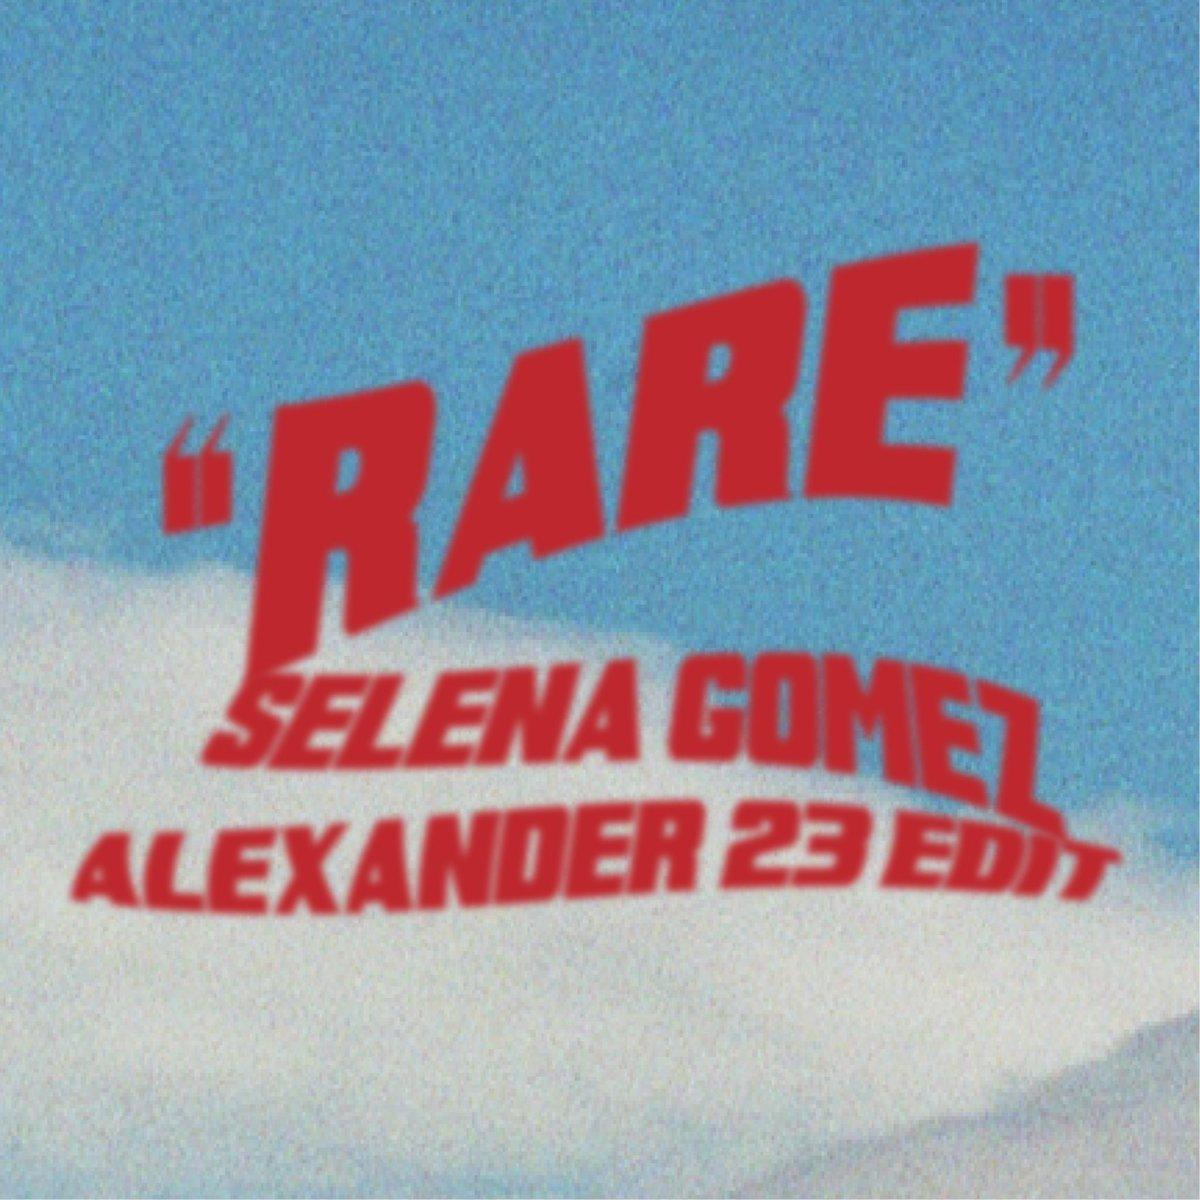 Rare - A23 Edit is out Friday! 🦋 @alexander23lol https://smarturl.it/presaveRareA23edit…